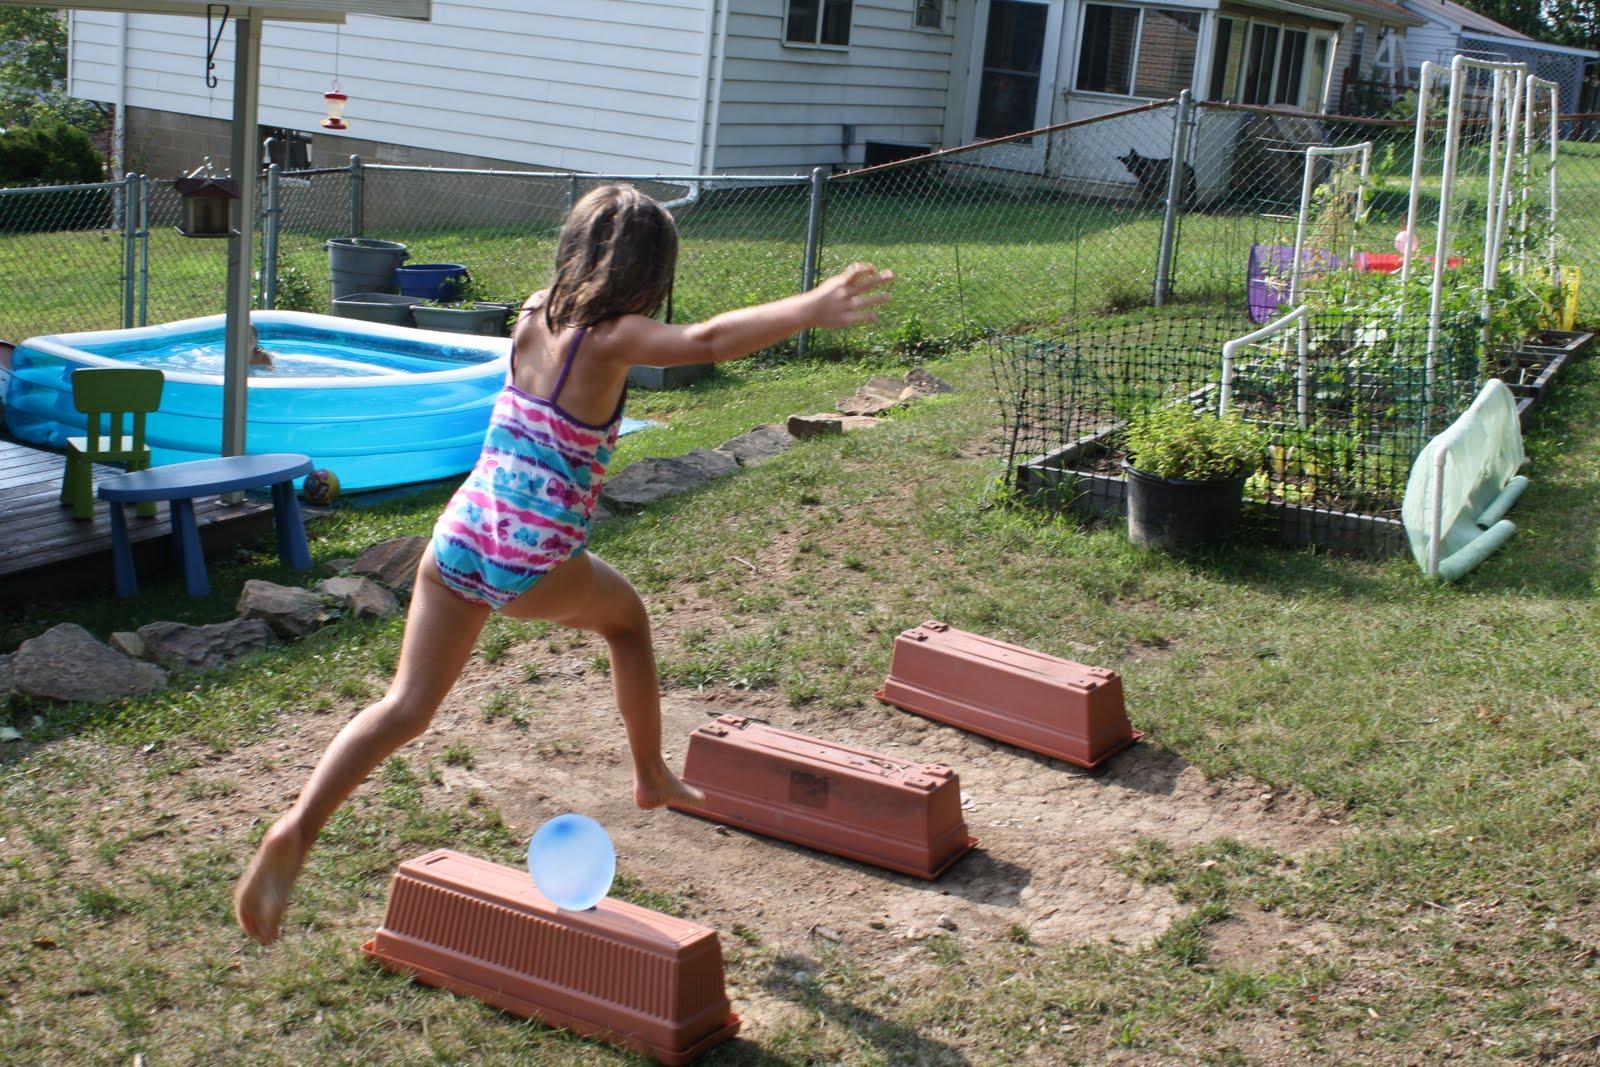 pencils proverbs pandemonium pins backyard obstacle course